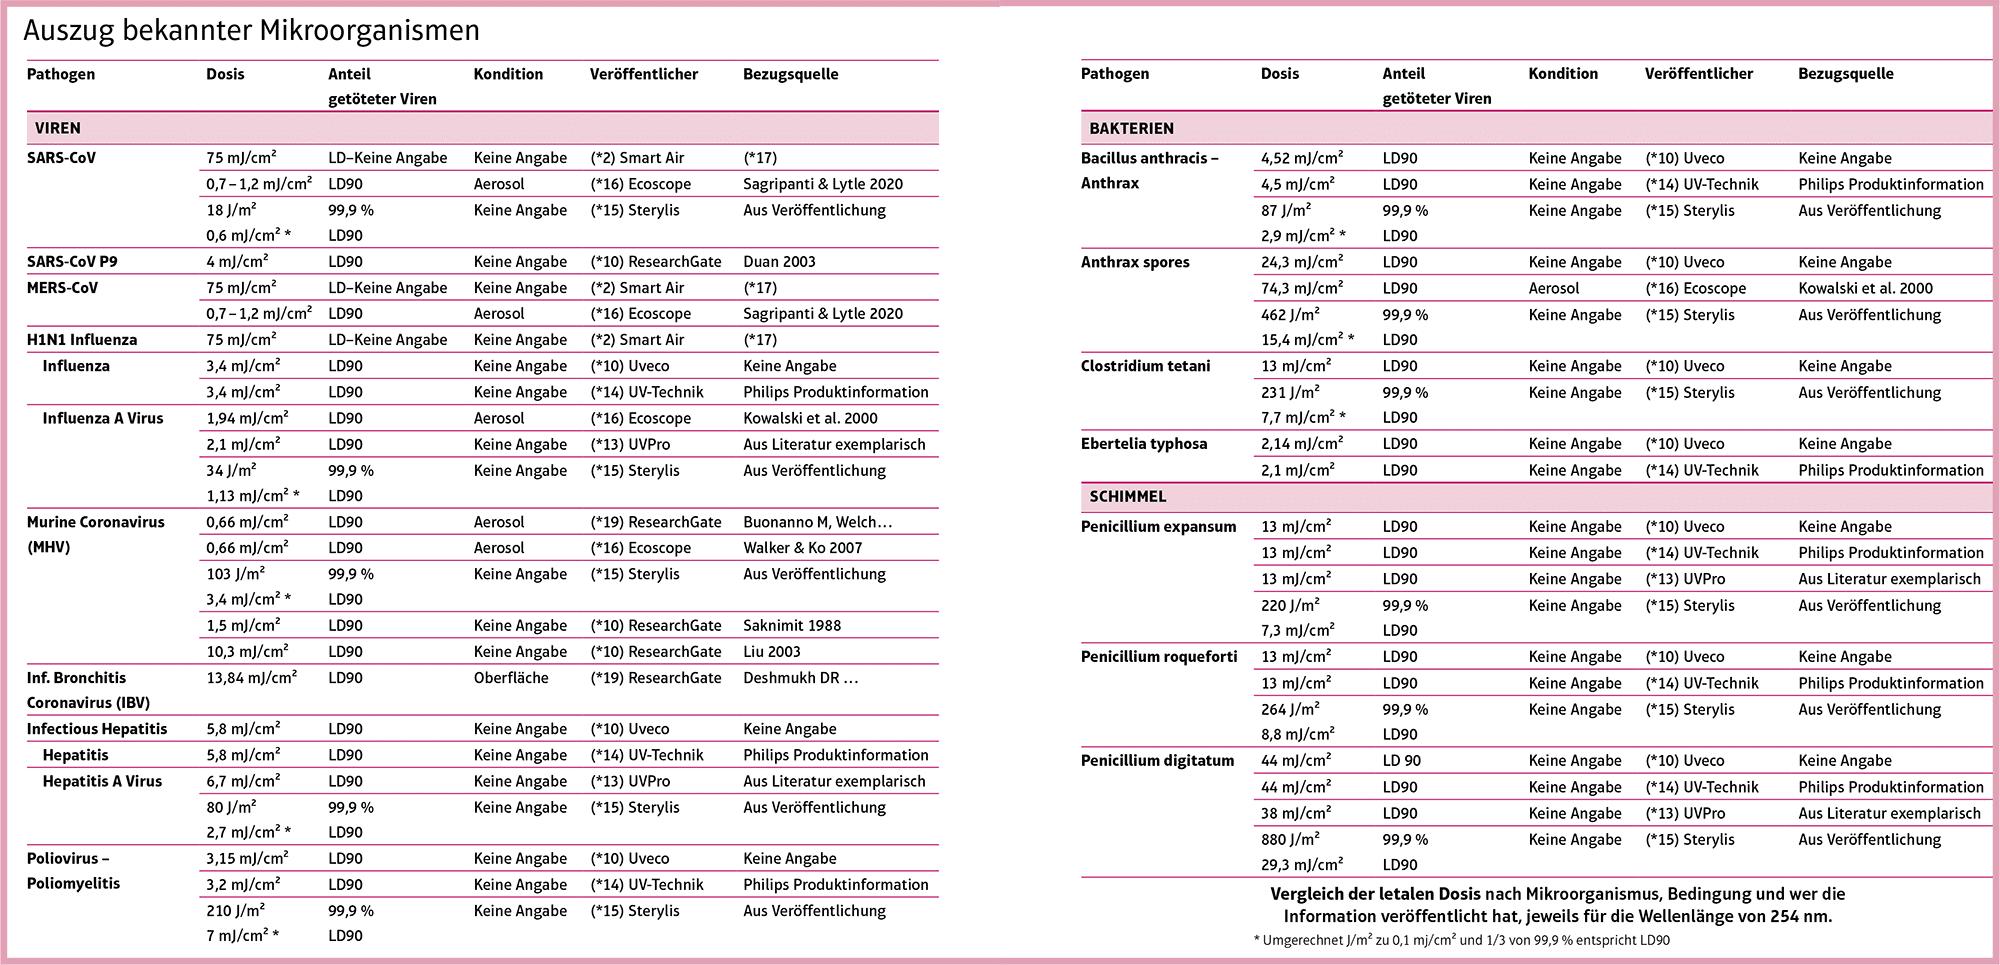 Auszug bekannter Mikroorganismen Tabelle